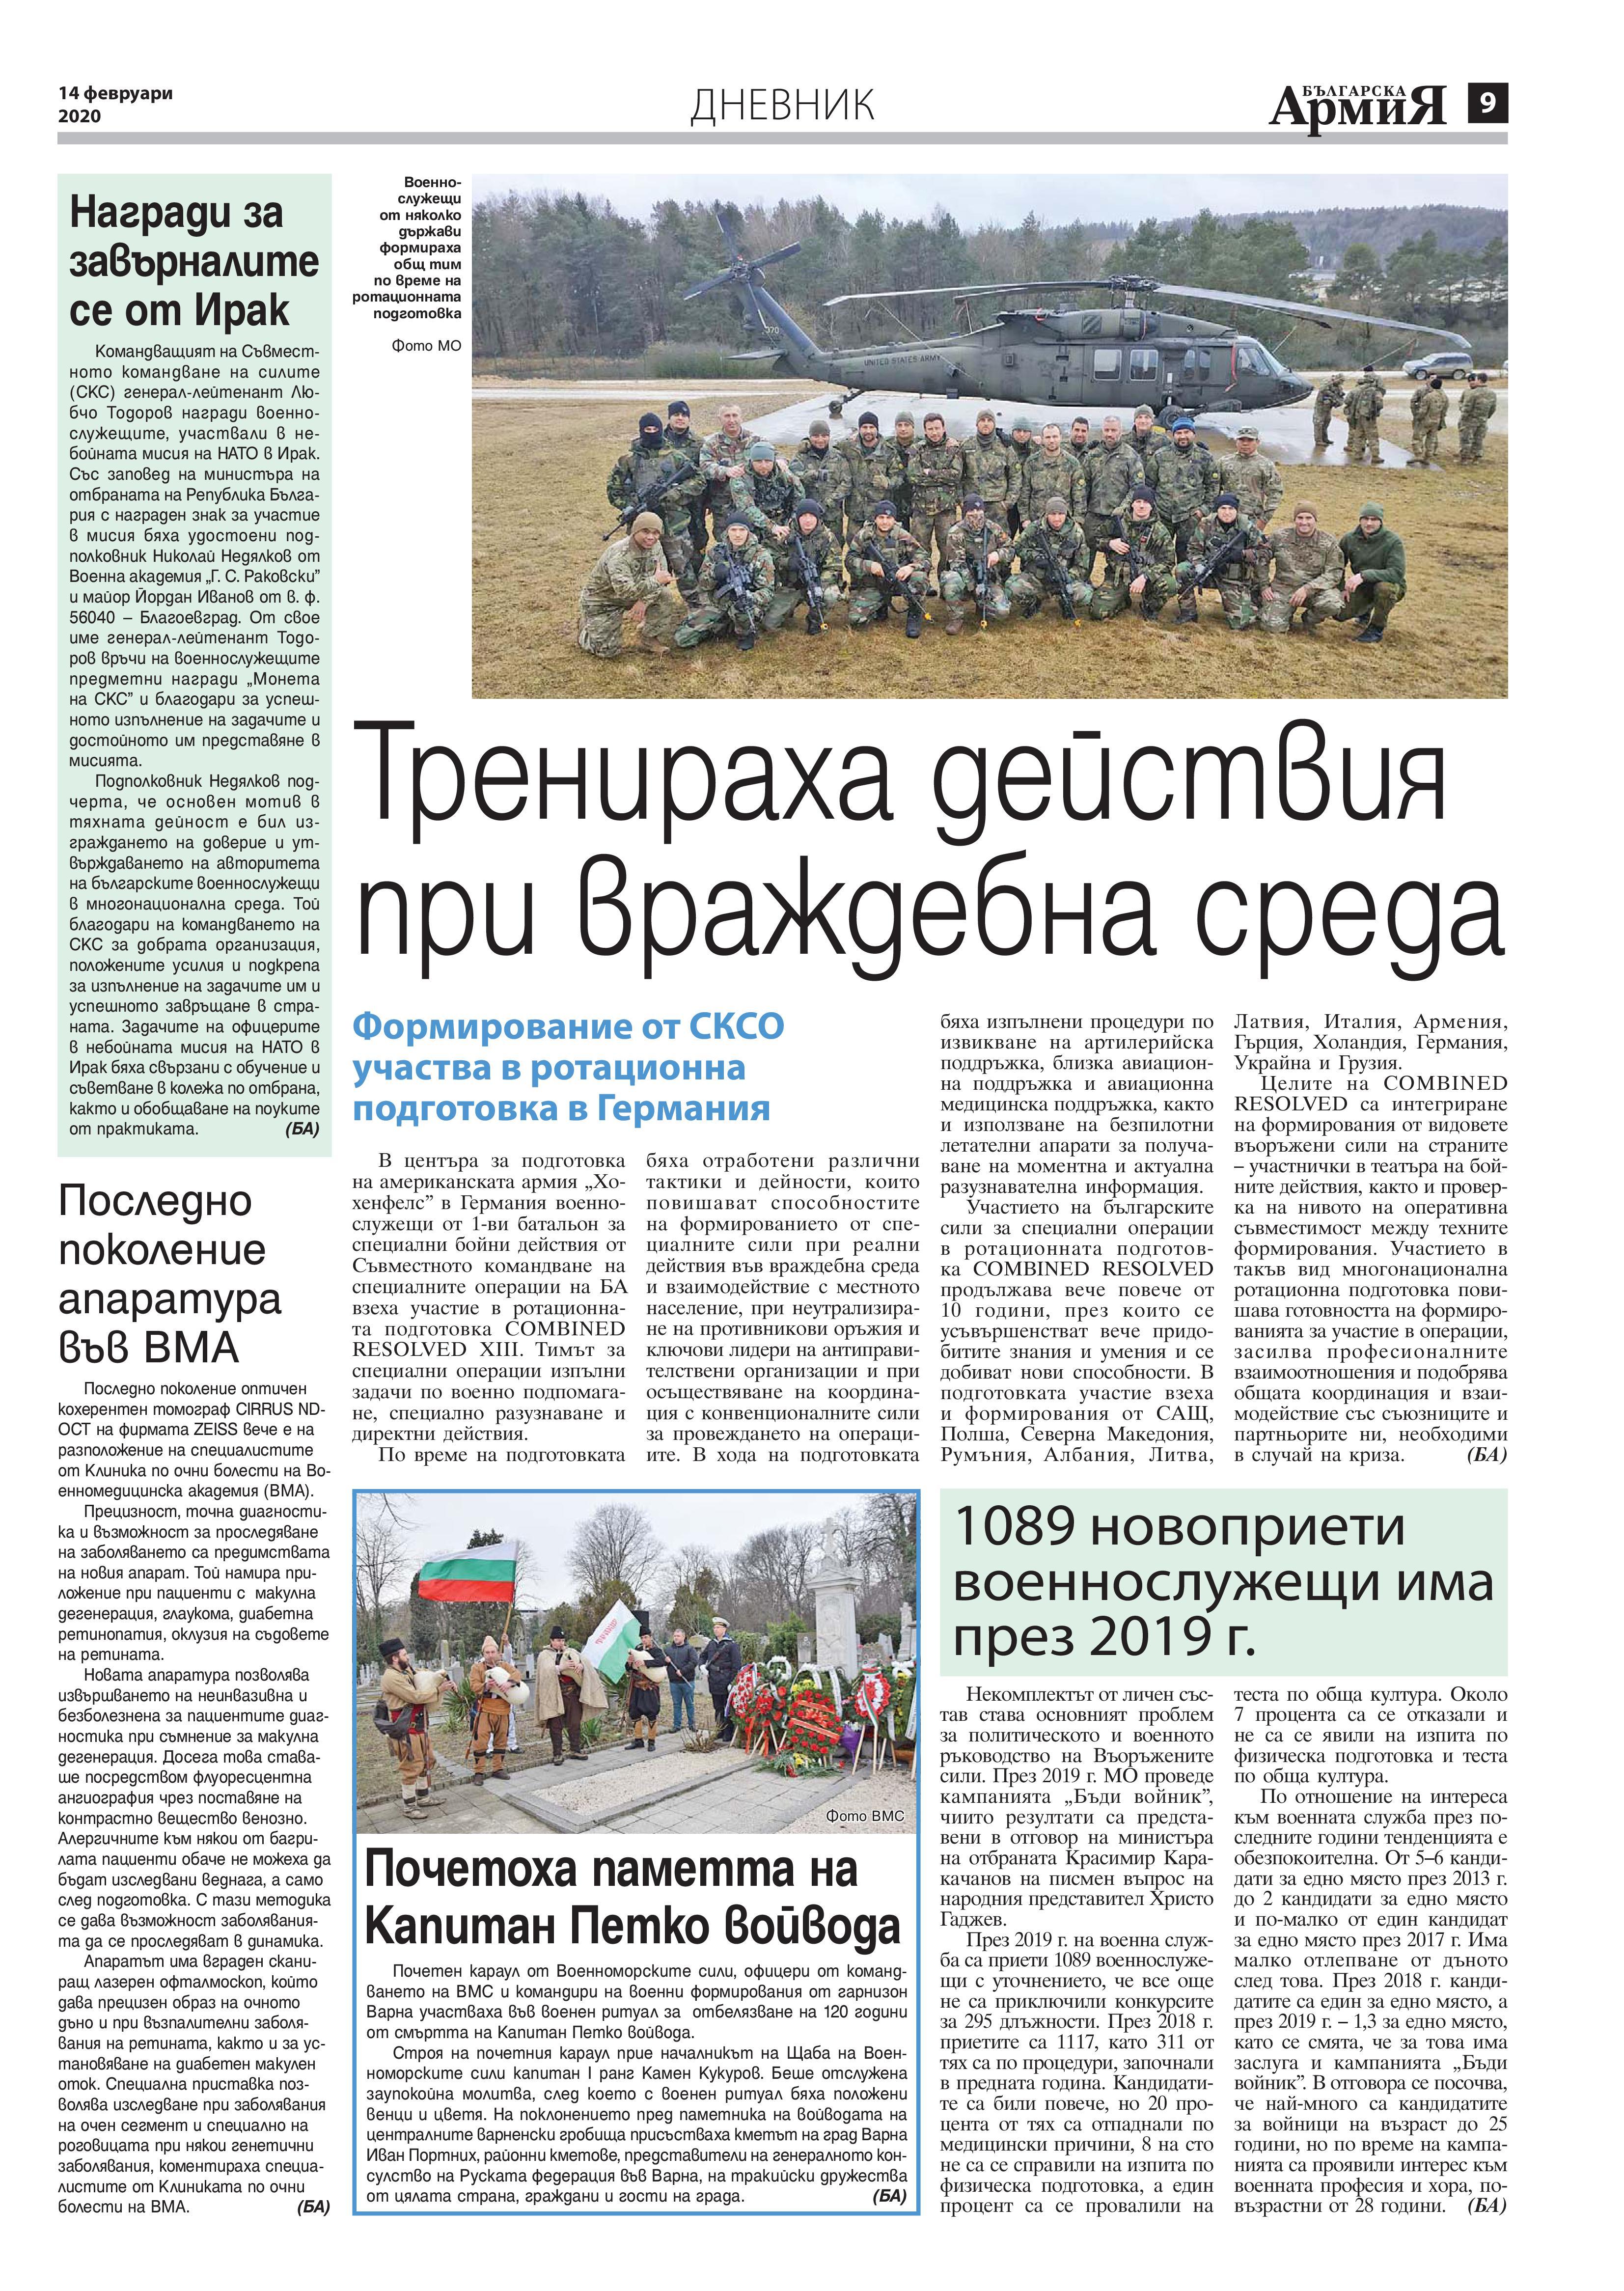 https://www.armymedia.bg/wp-content/uploads/2015/06/09-34.jpg